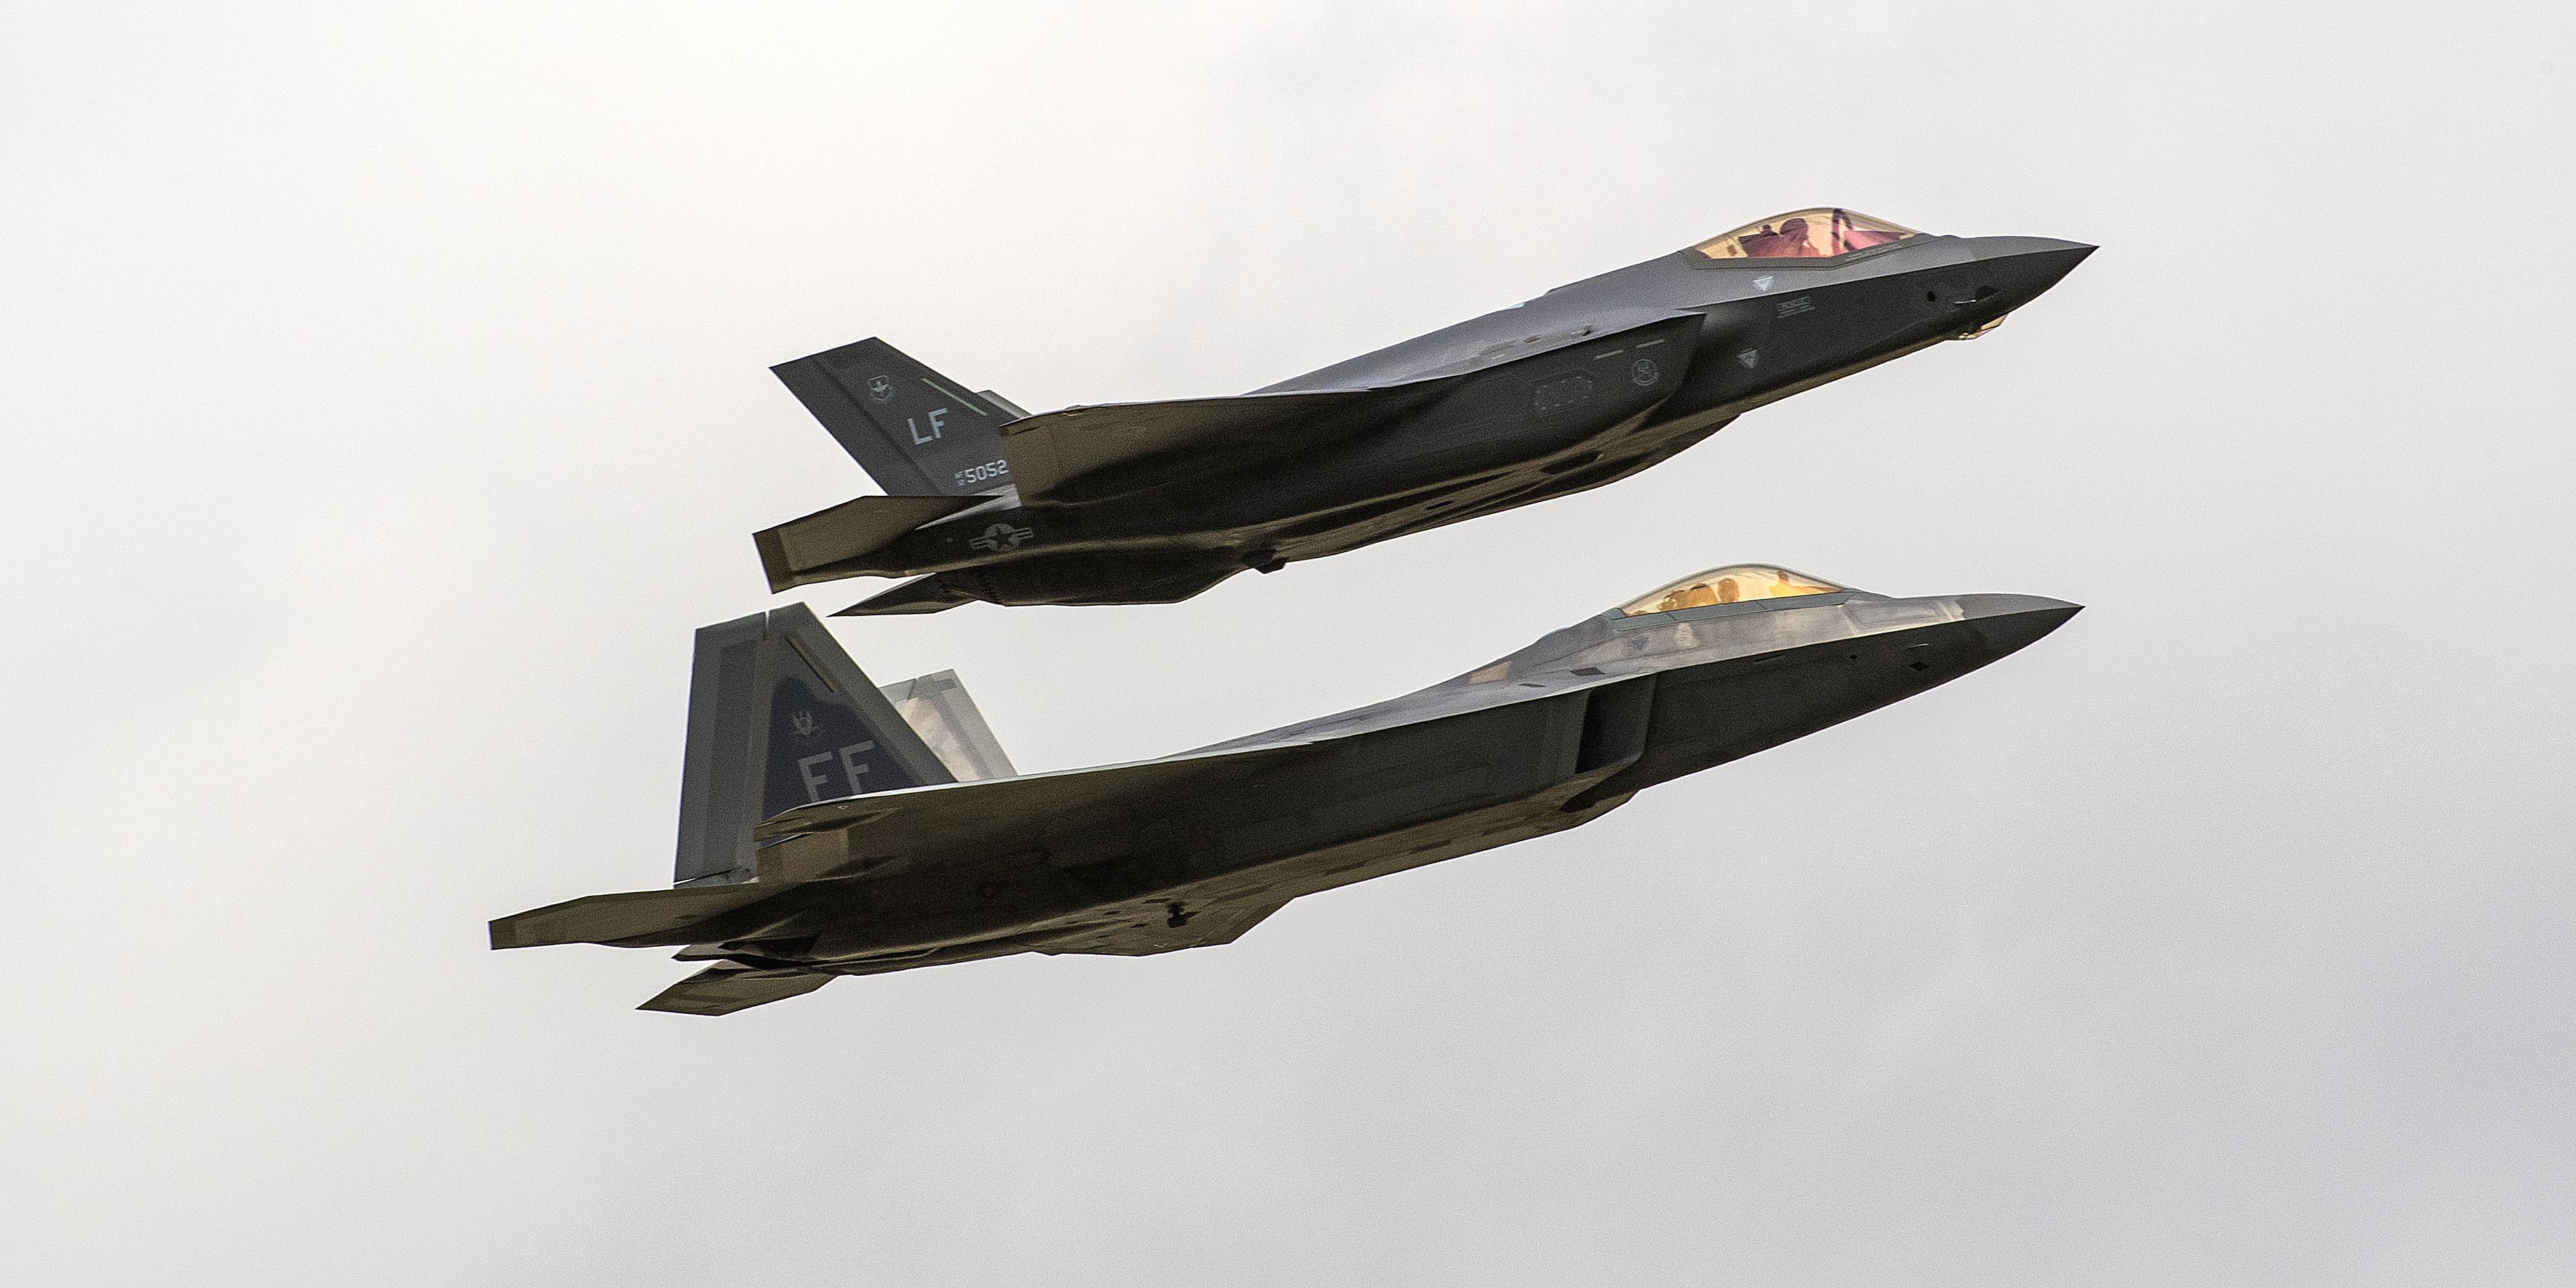 Lockheed Martin-made F-22 and F-35 warplanes together in flight.